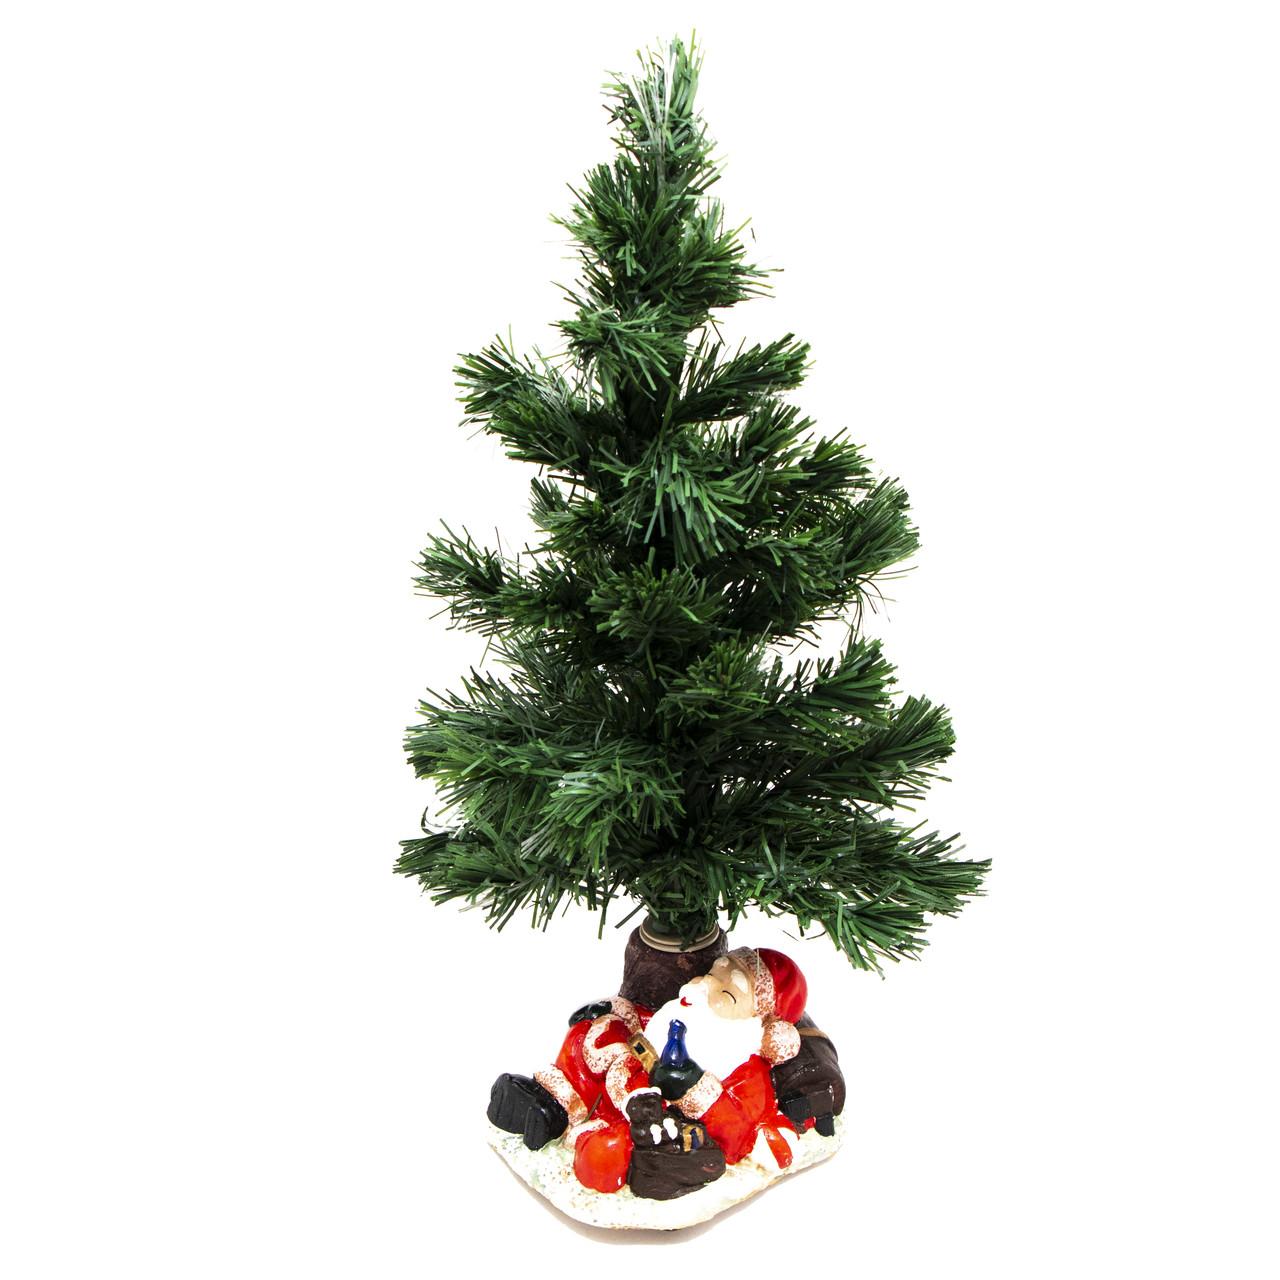 Елка ПВХ на подставке с Дедом Морозом 11,5*9*36,5см (011407)